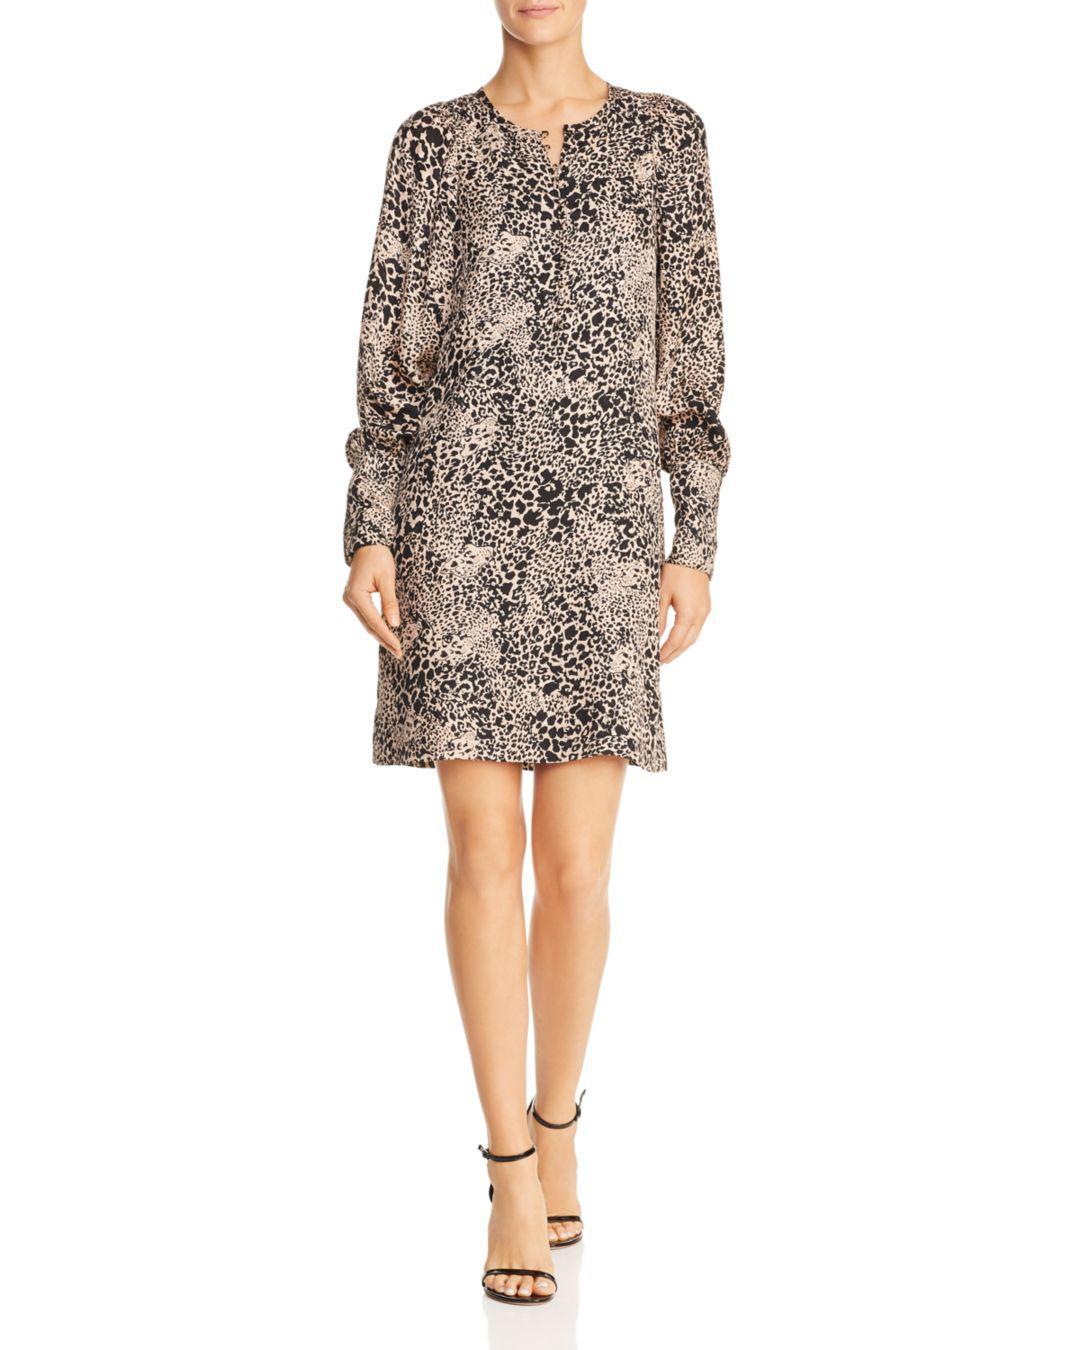 8409508d6d2e Lyst - Rebecca Taylor Hidden Leopard Jacquard Dress Champagne, Size ...